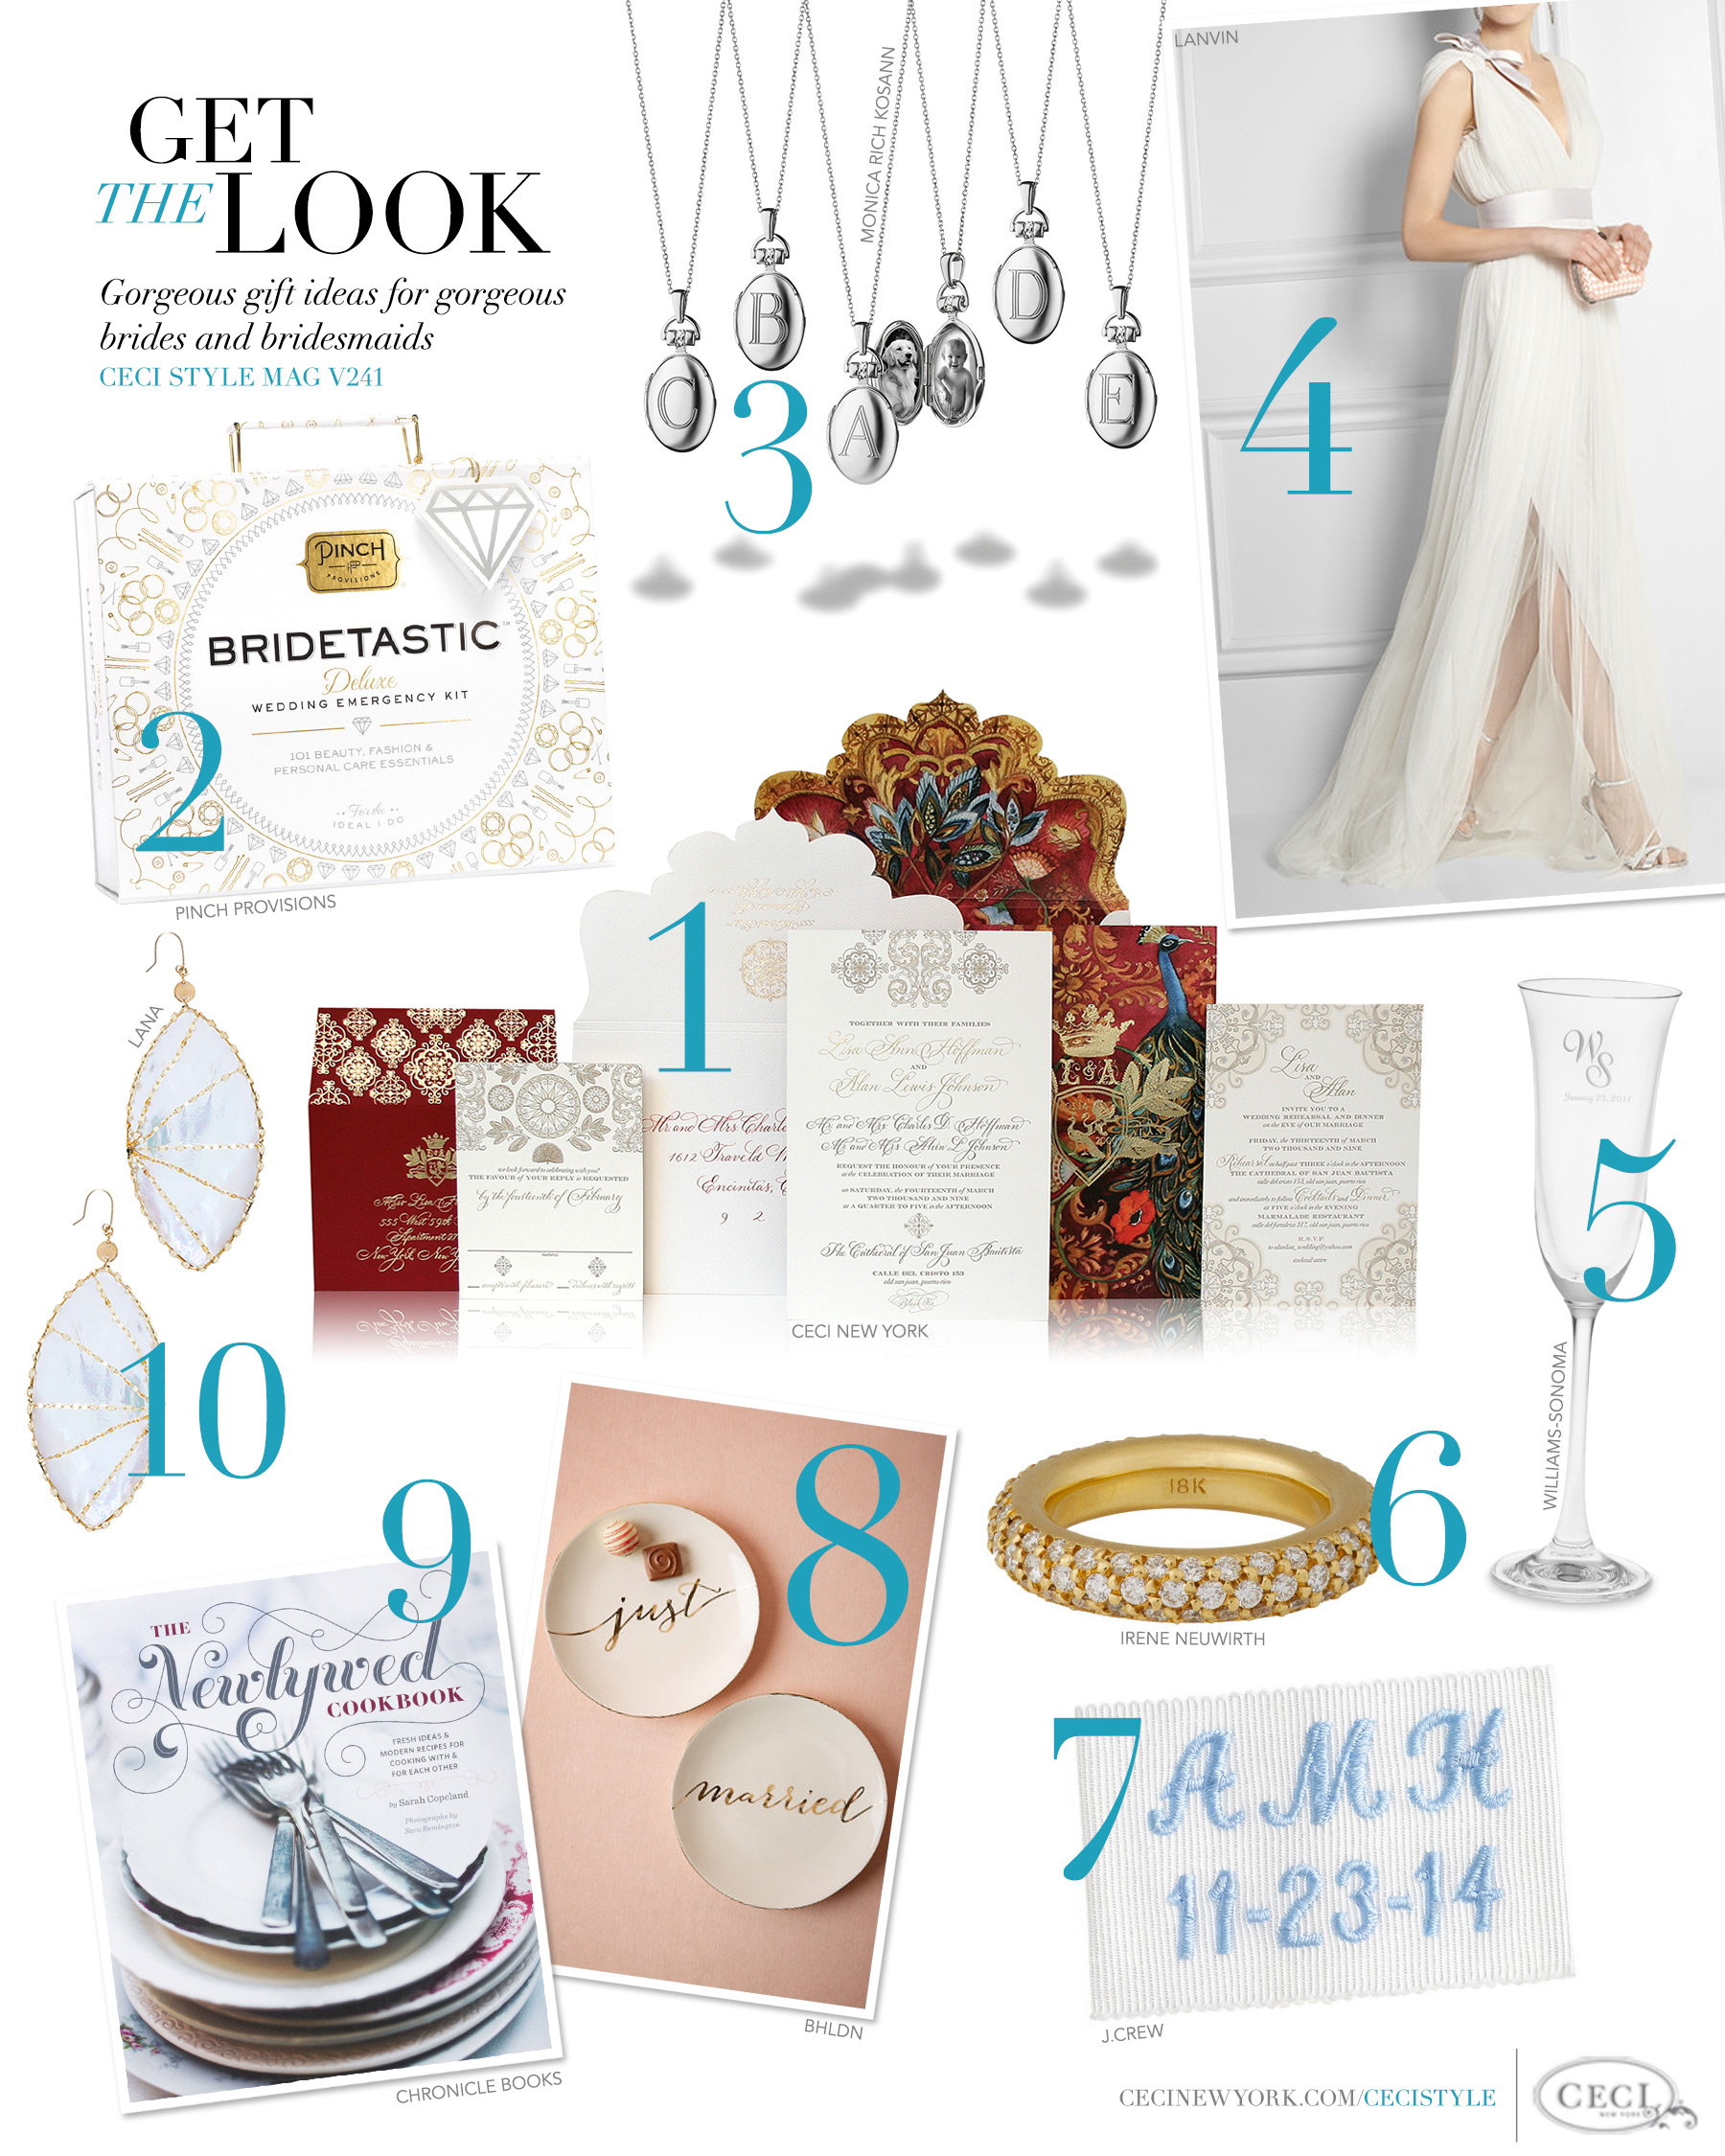 New York - ceci new york, wedding invitation, wedding gift ideas, gift ...